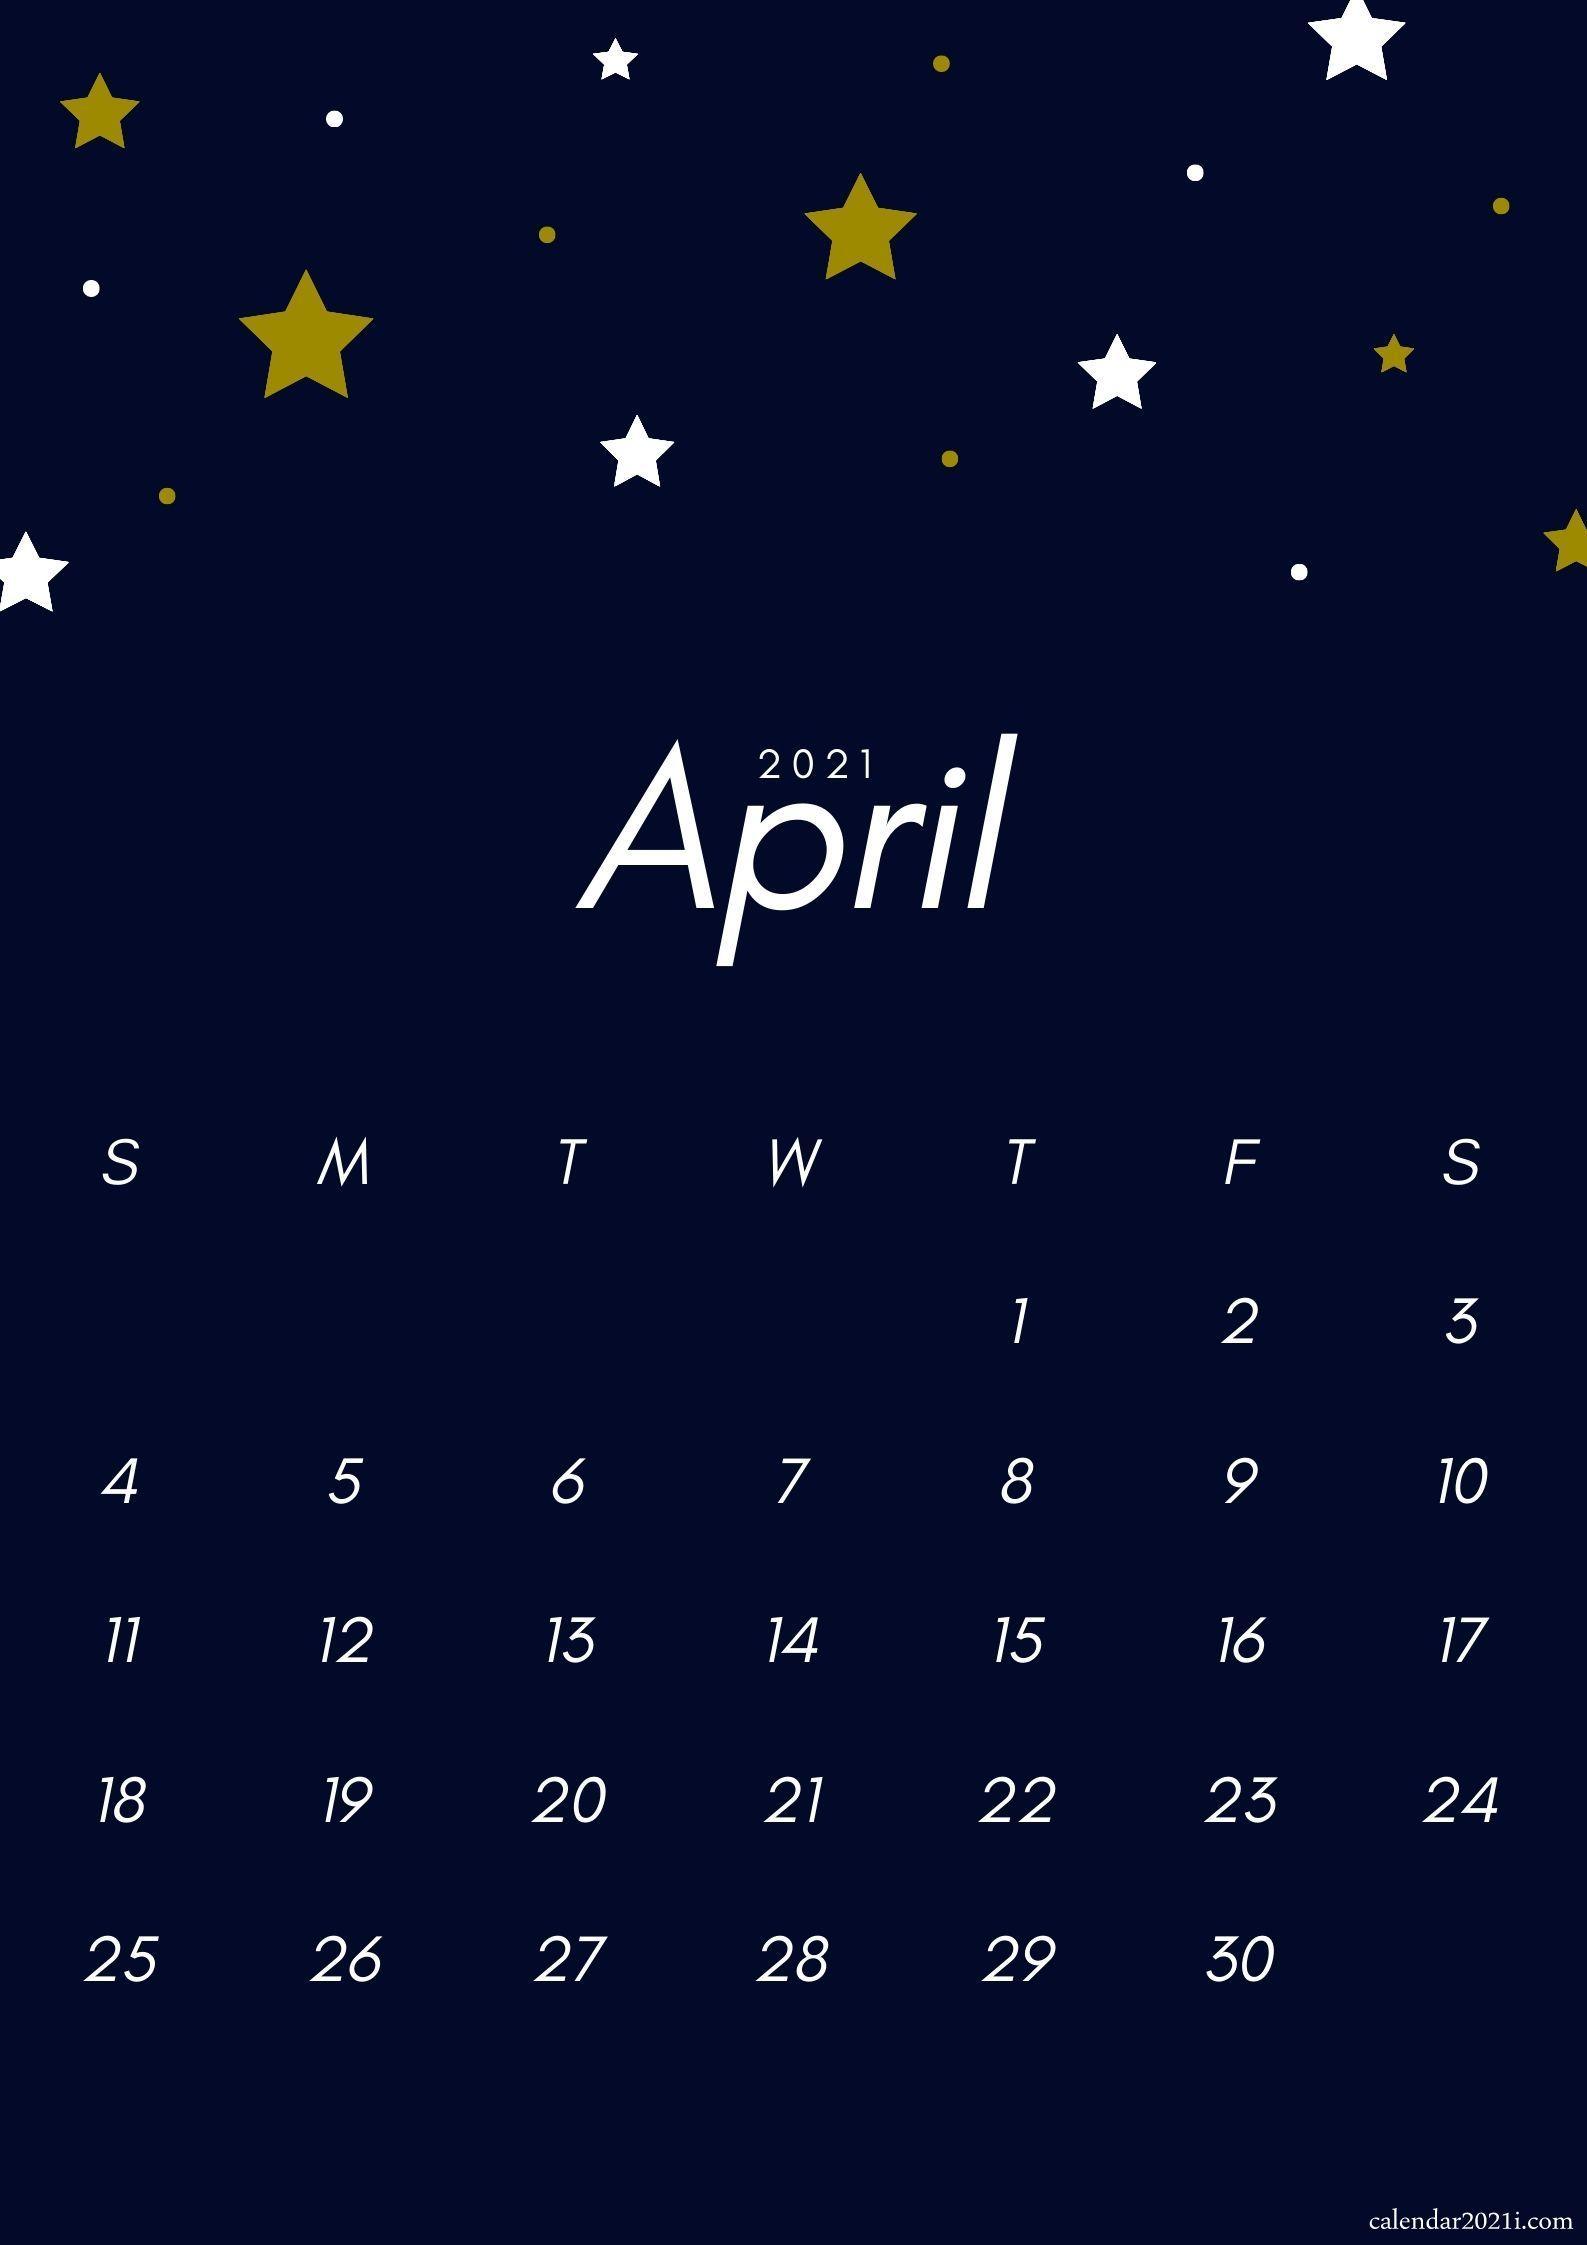 April 2021 Wallpaper Calendar iPhone April 2021 Calendar Wallpaper Free Download | Calendar